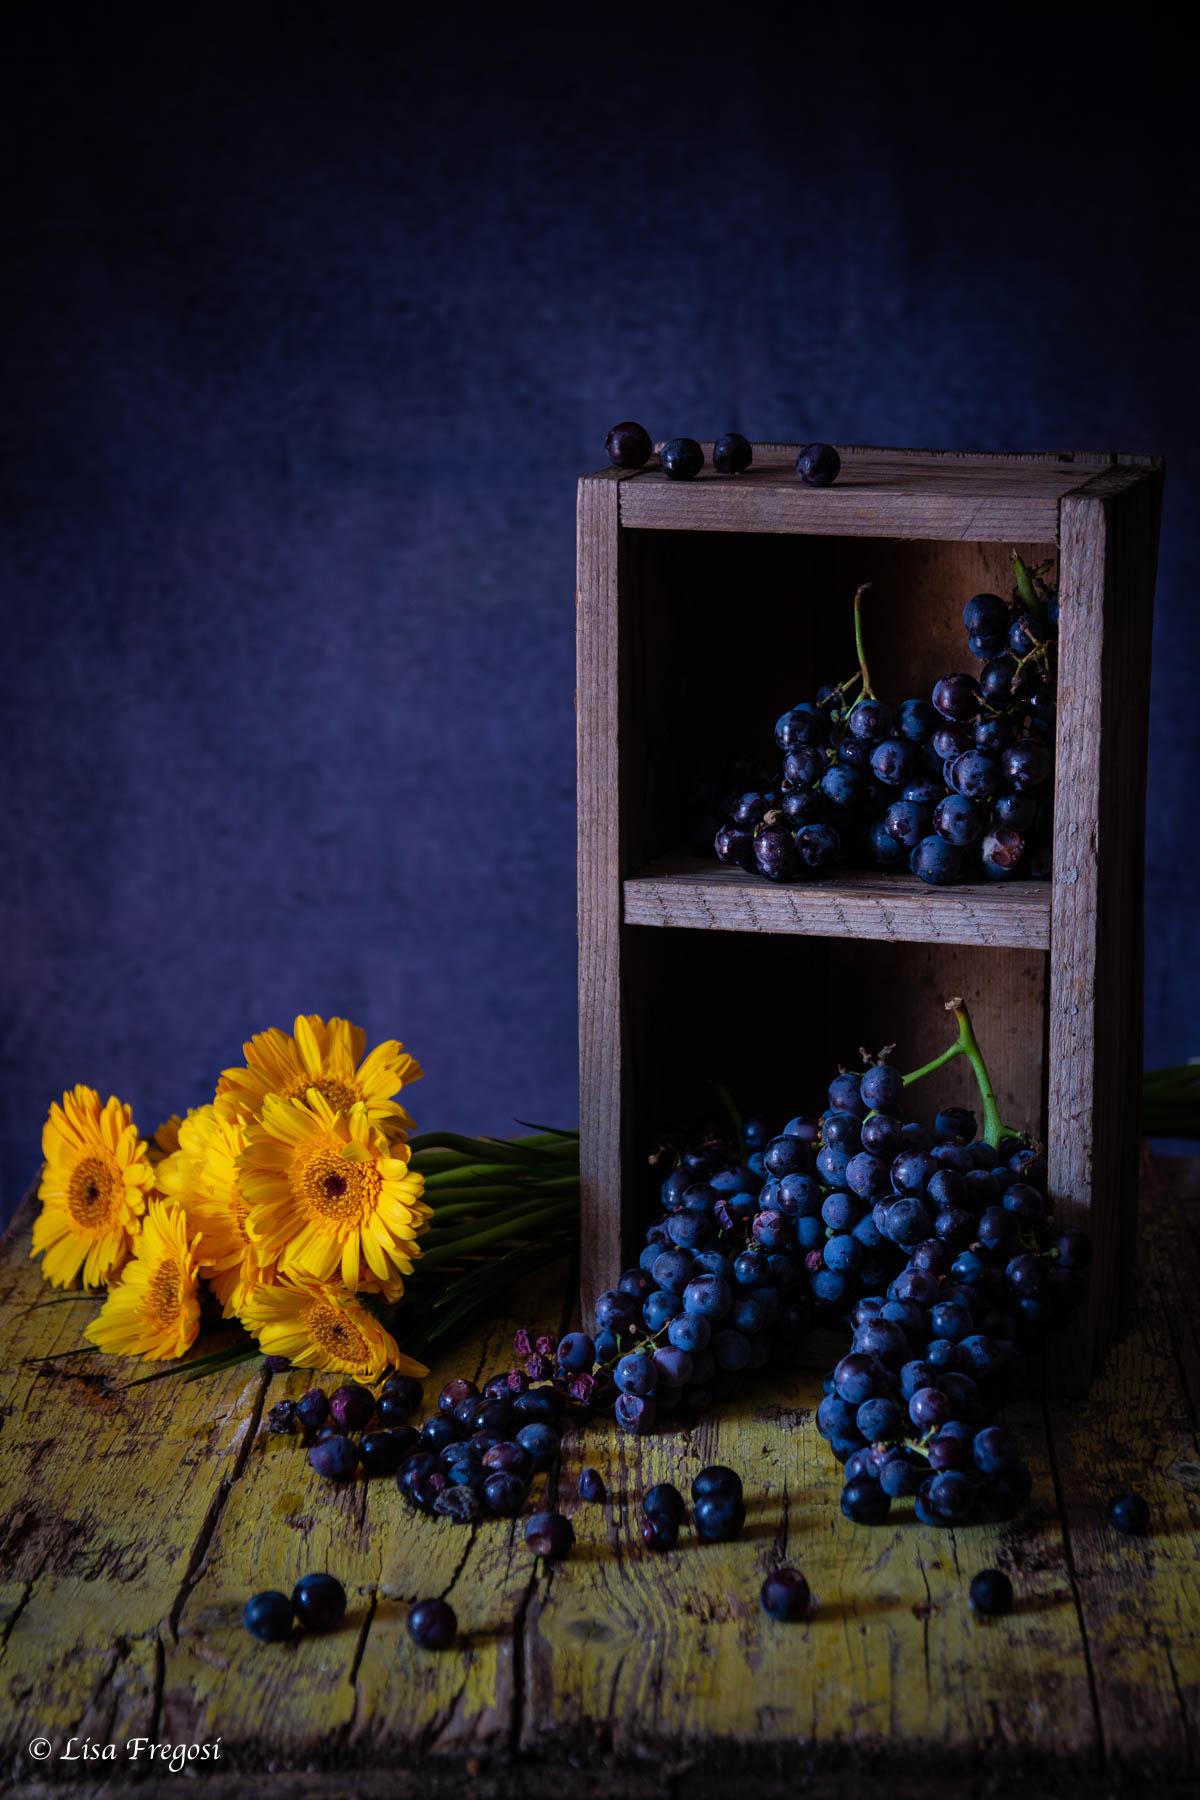 schiacciata ciaccia Toscana con uva canaiola